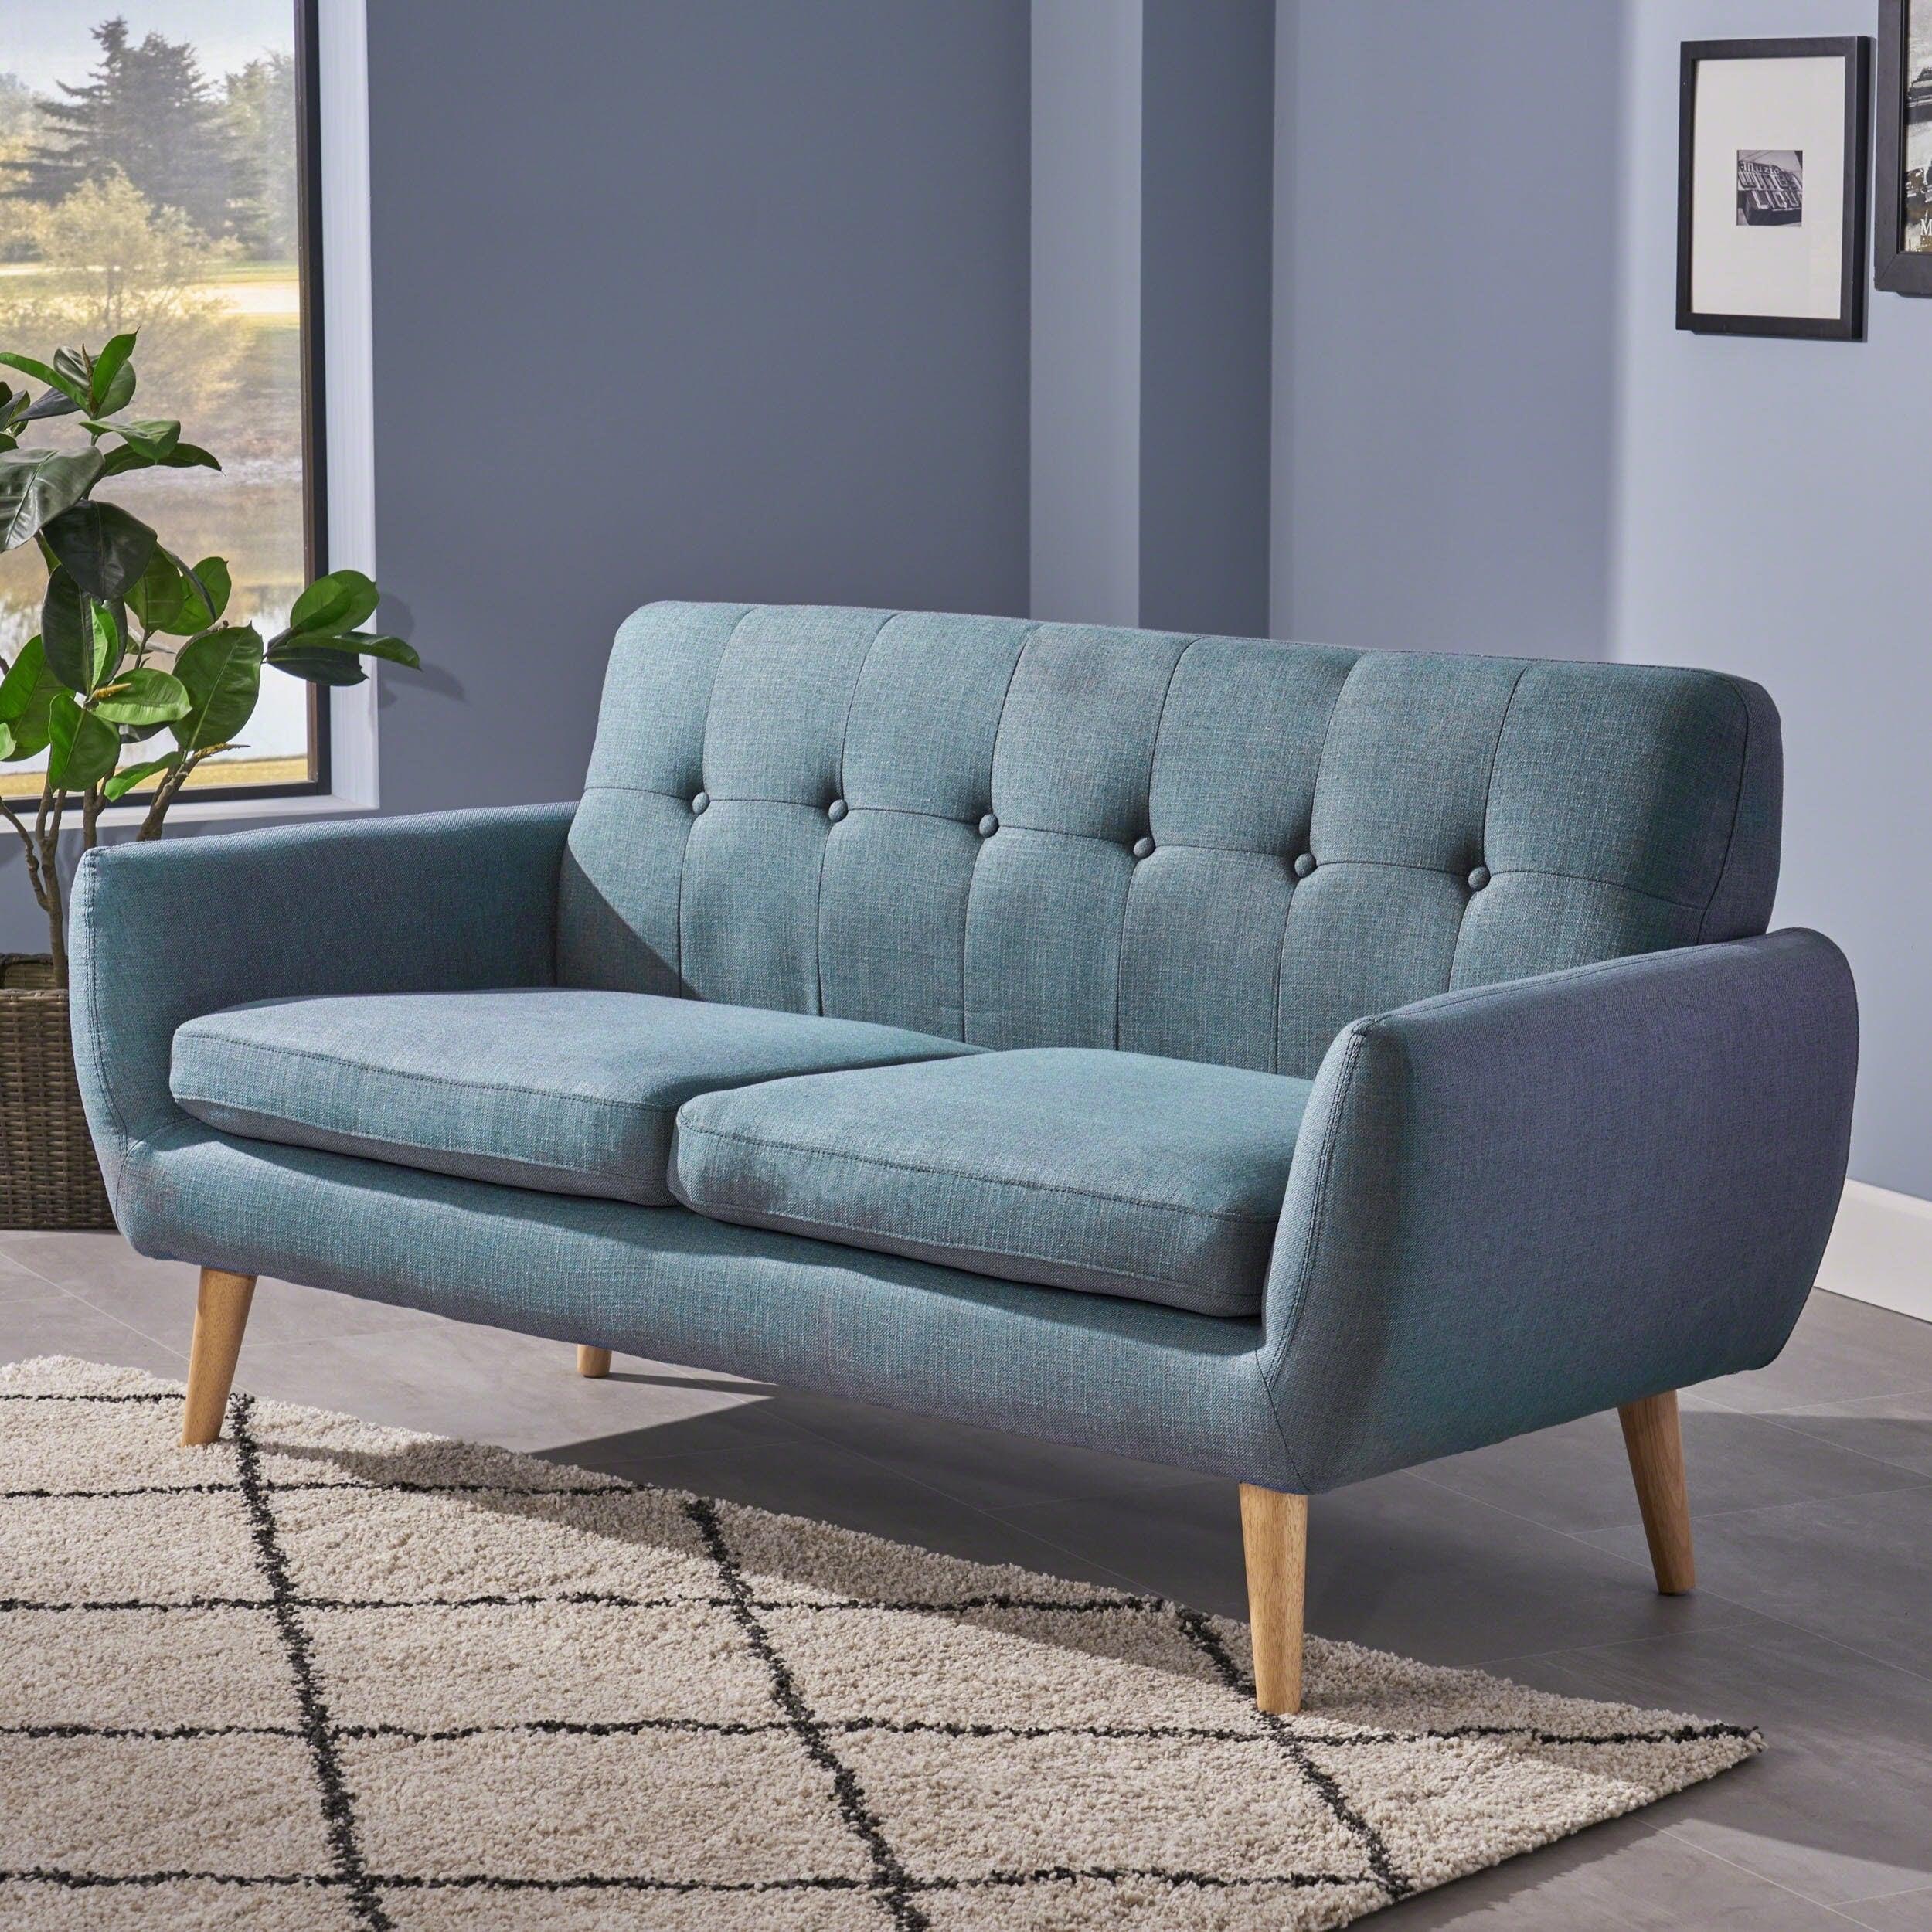 Enjoyable Josephine Mid Century Modern Tufted Fabric Upholstered Sofa By Christopher Knight Home Spiritservingveterans Wood Chair Design Ideas Spiritservingveteransorg